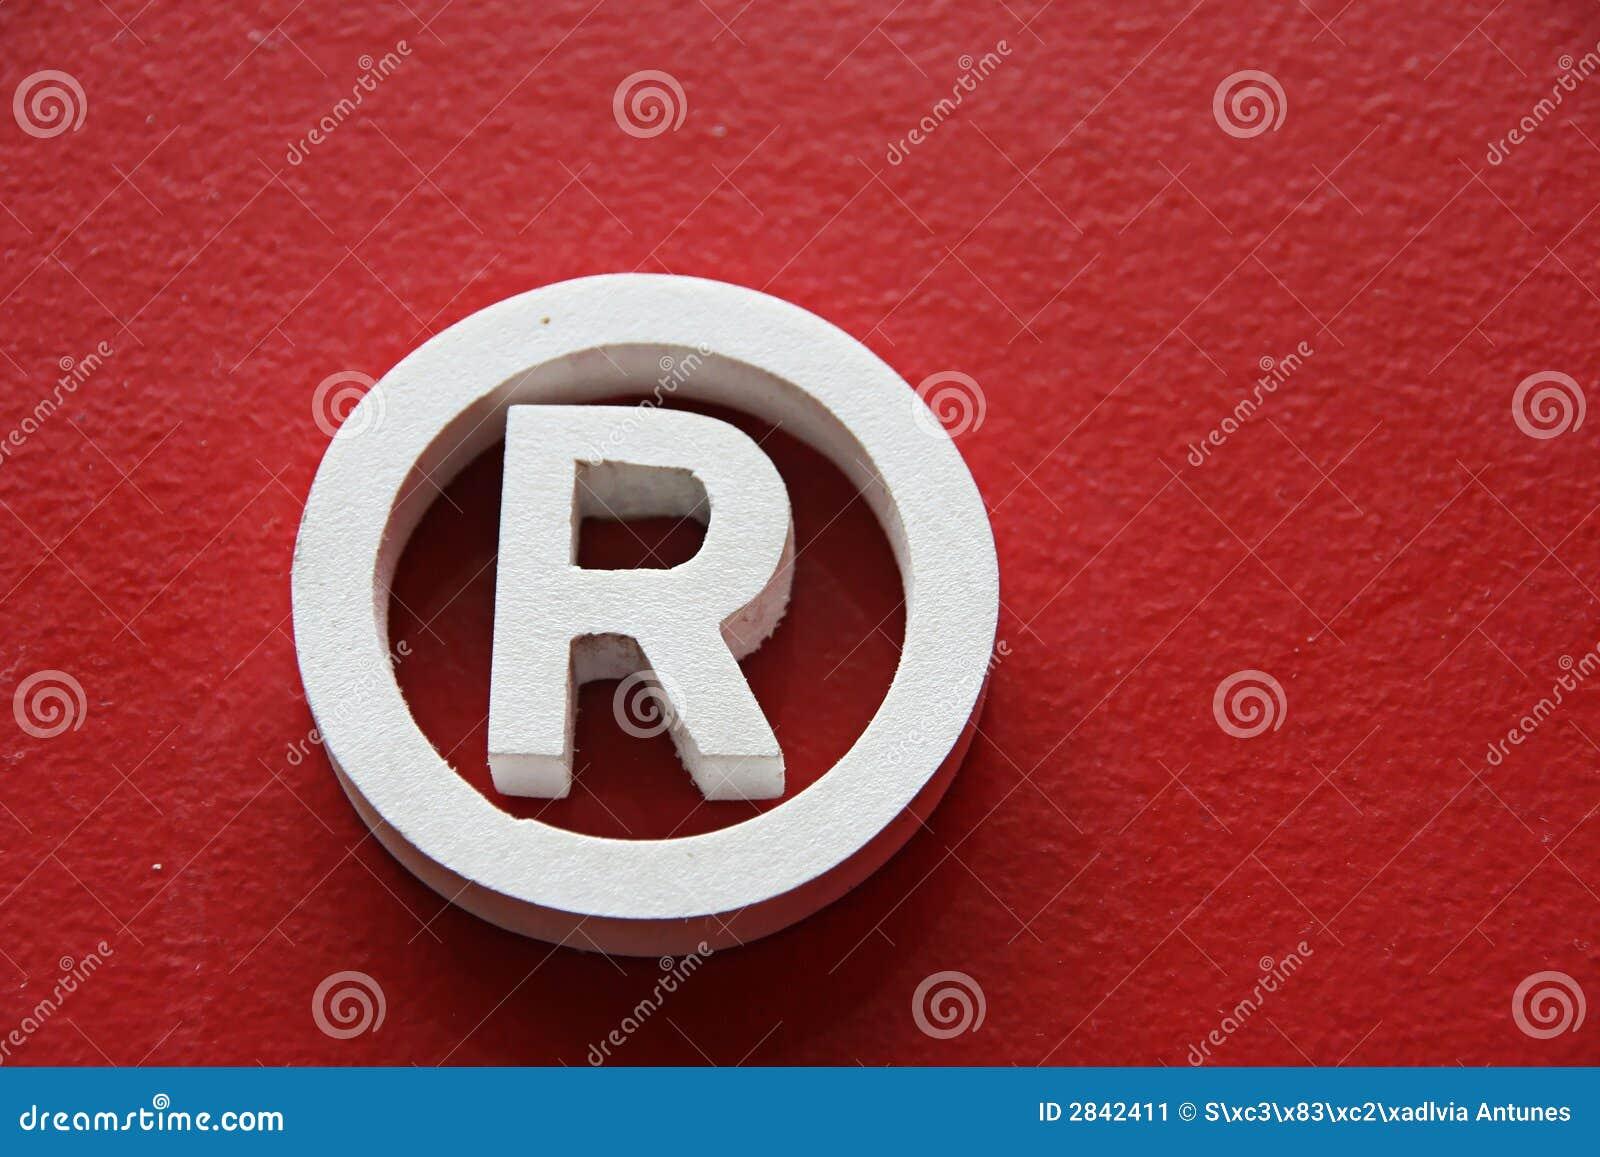 Marca registrada de R